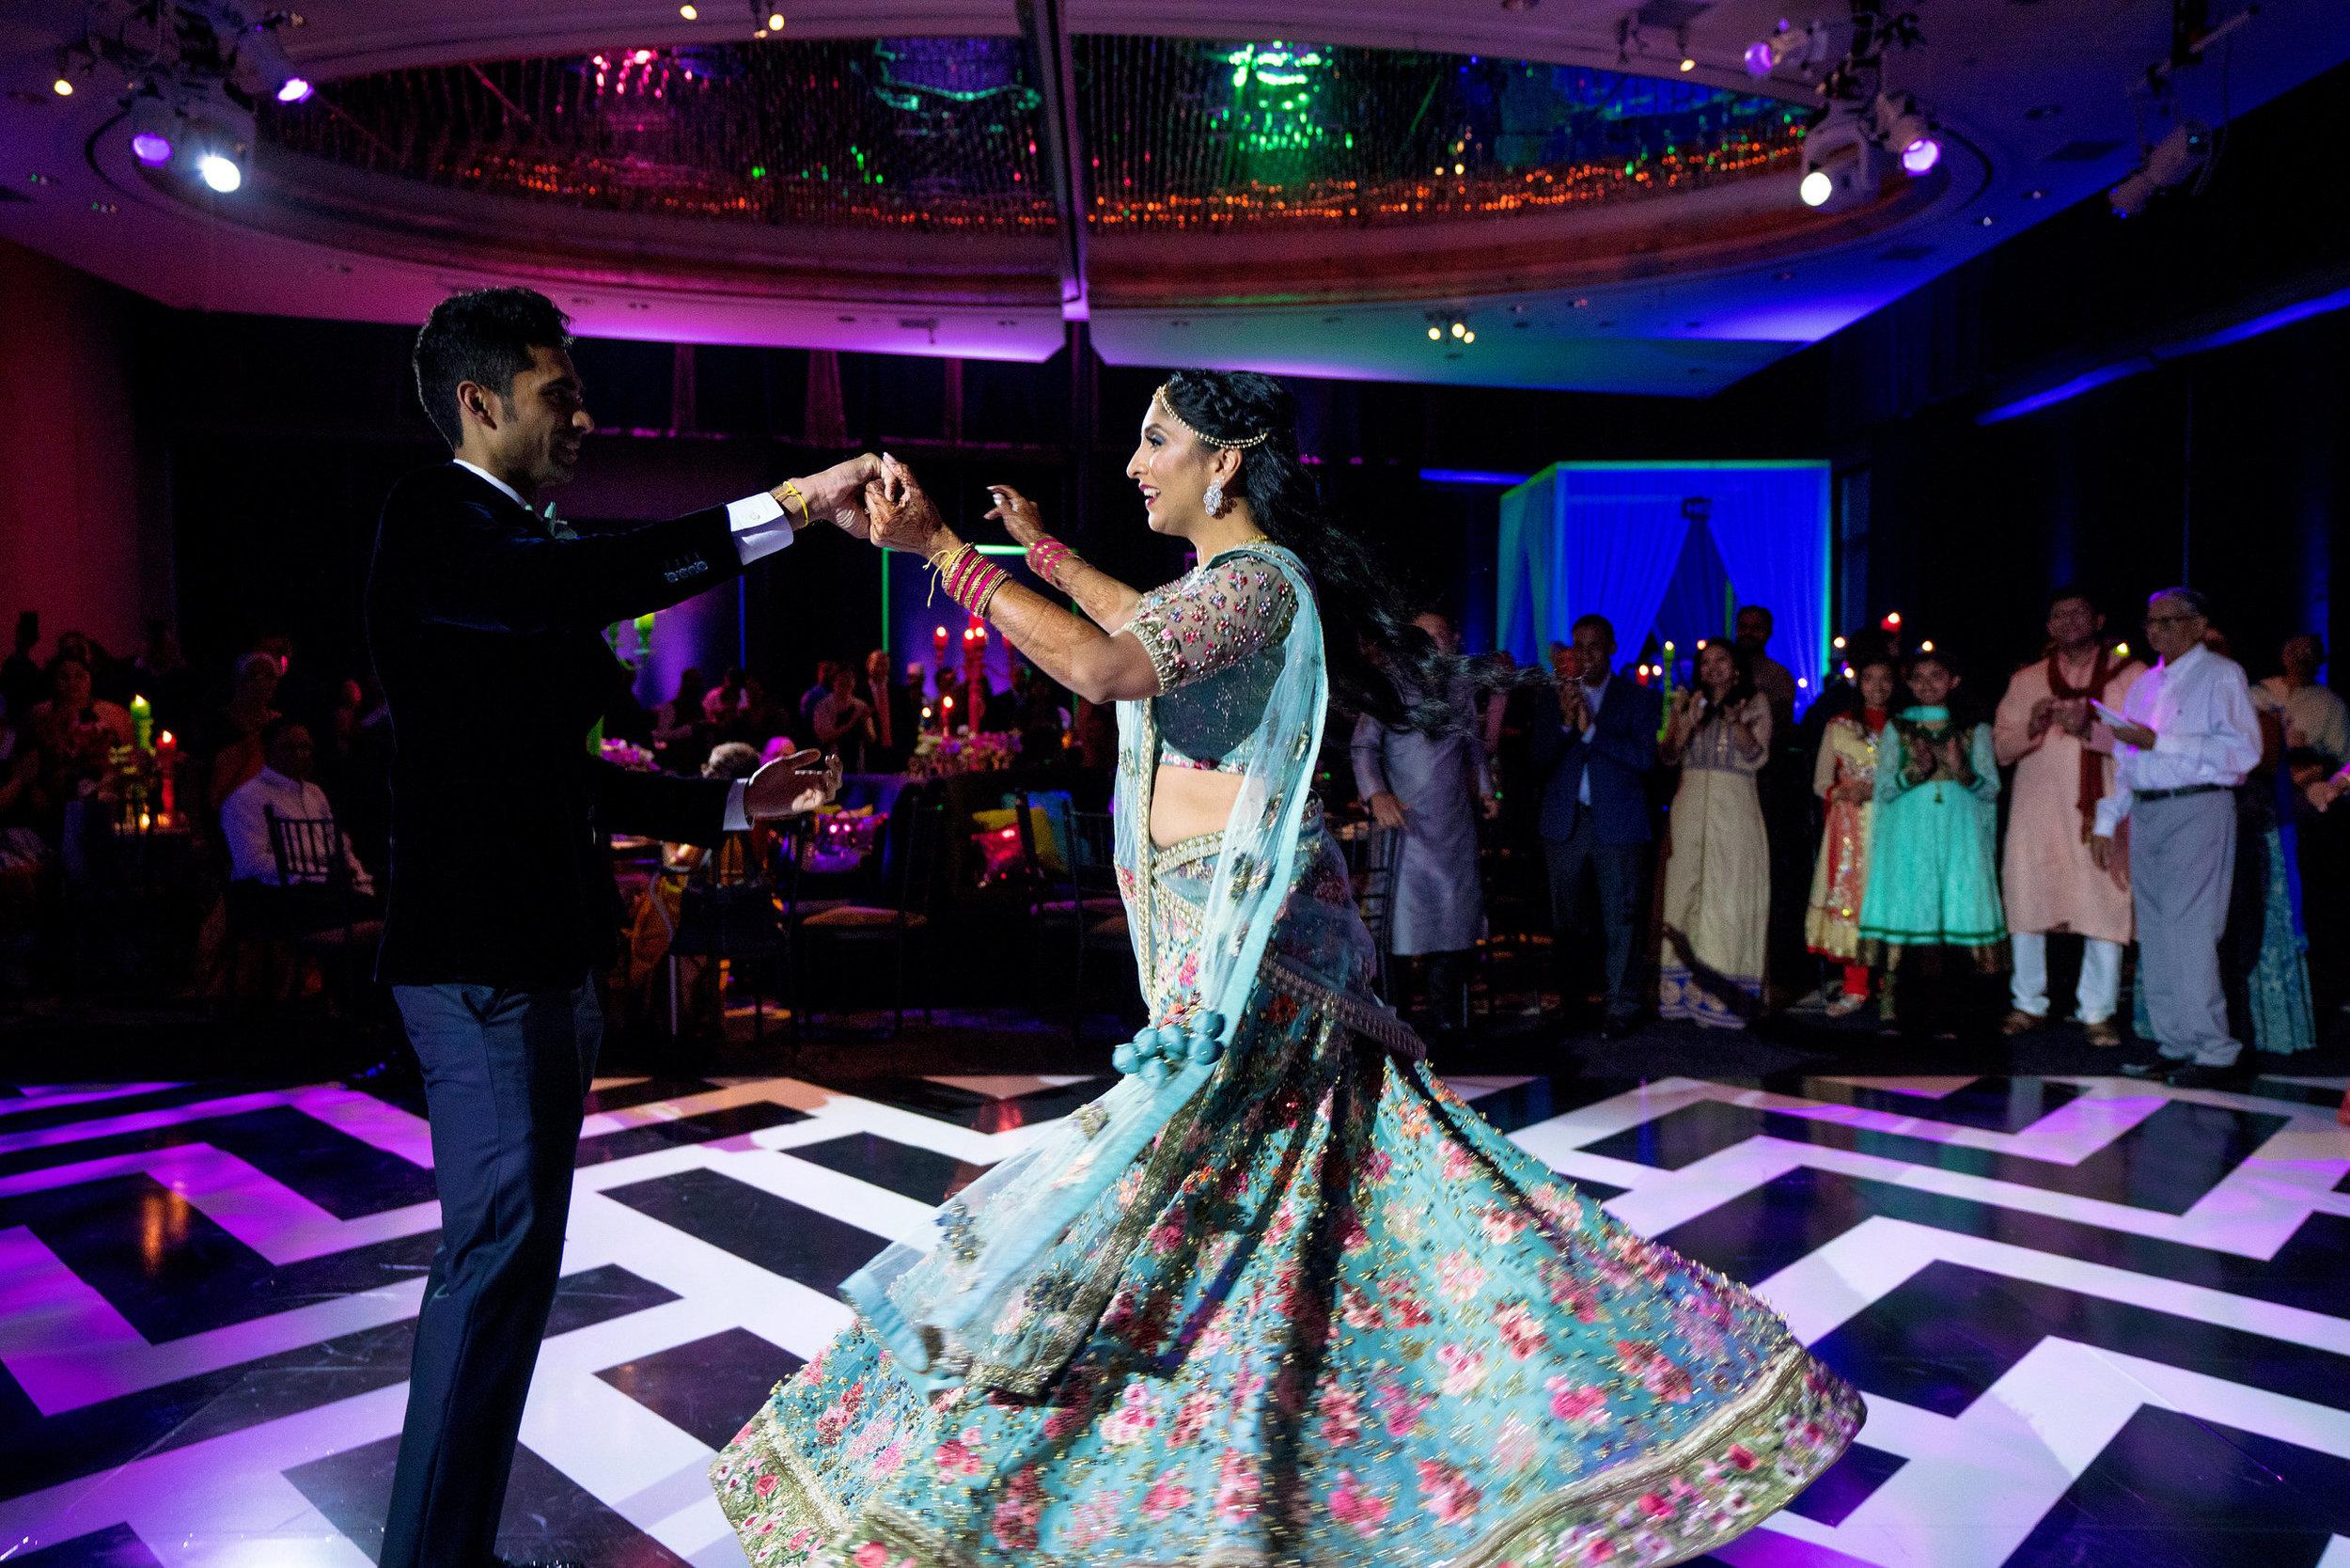 INDIAN WEDDING BRIDE AND GROOM RECEPTION DANCE.JPG